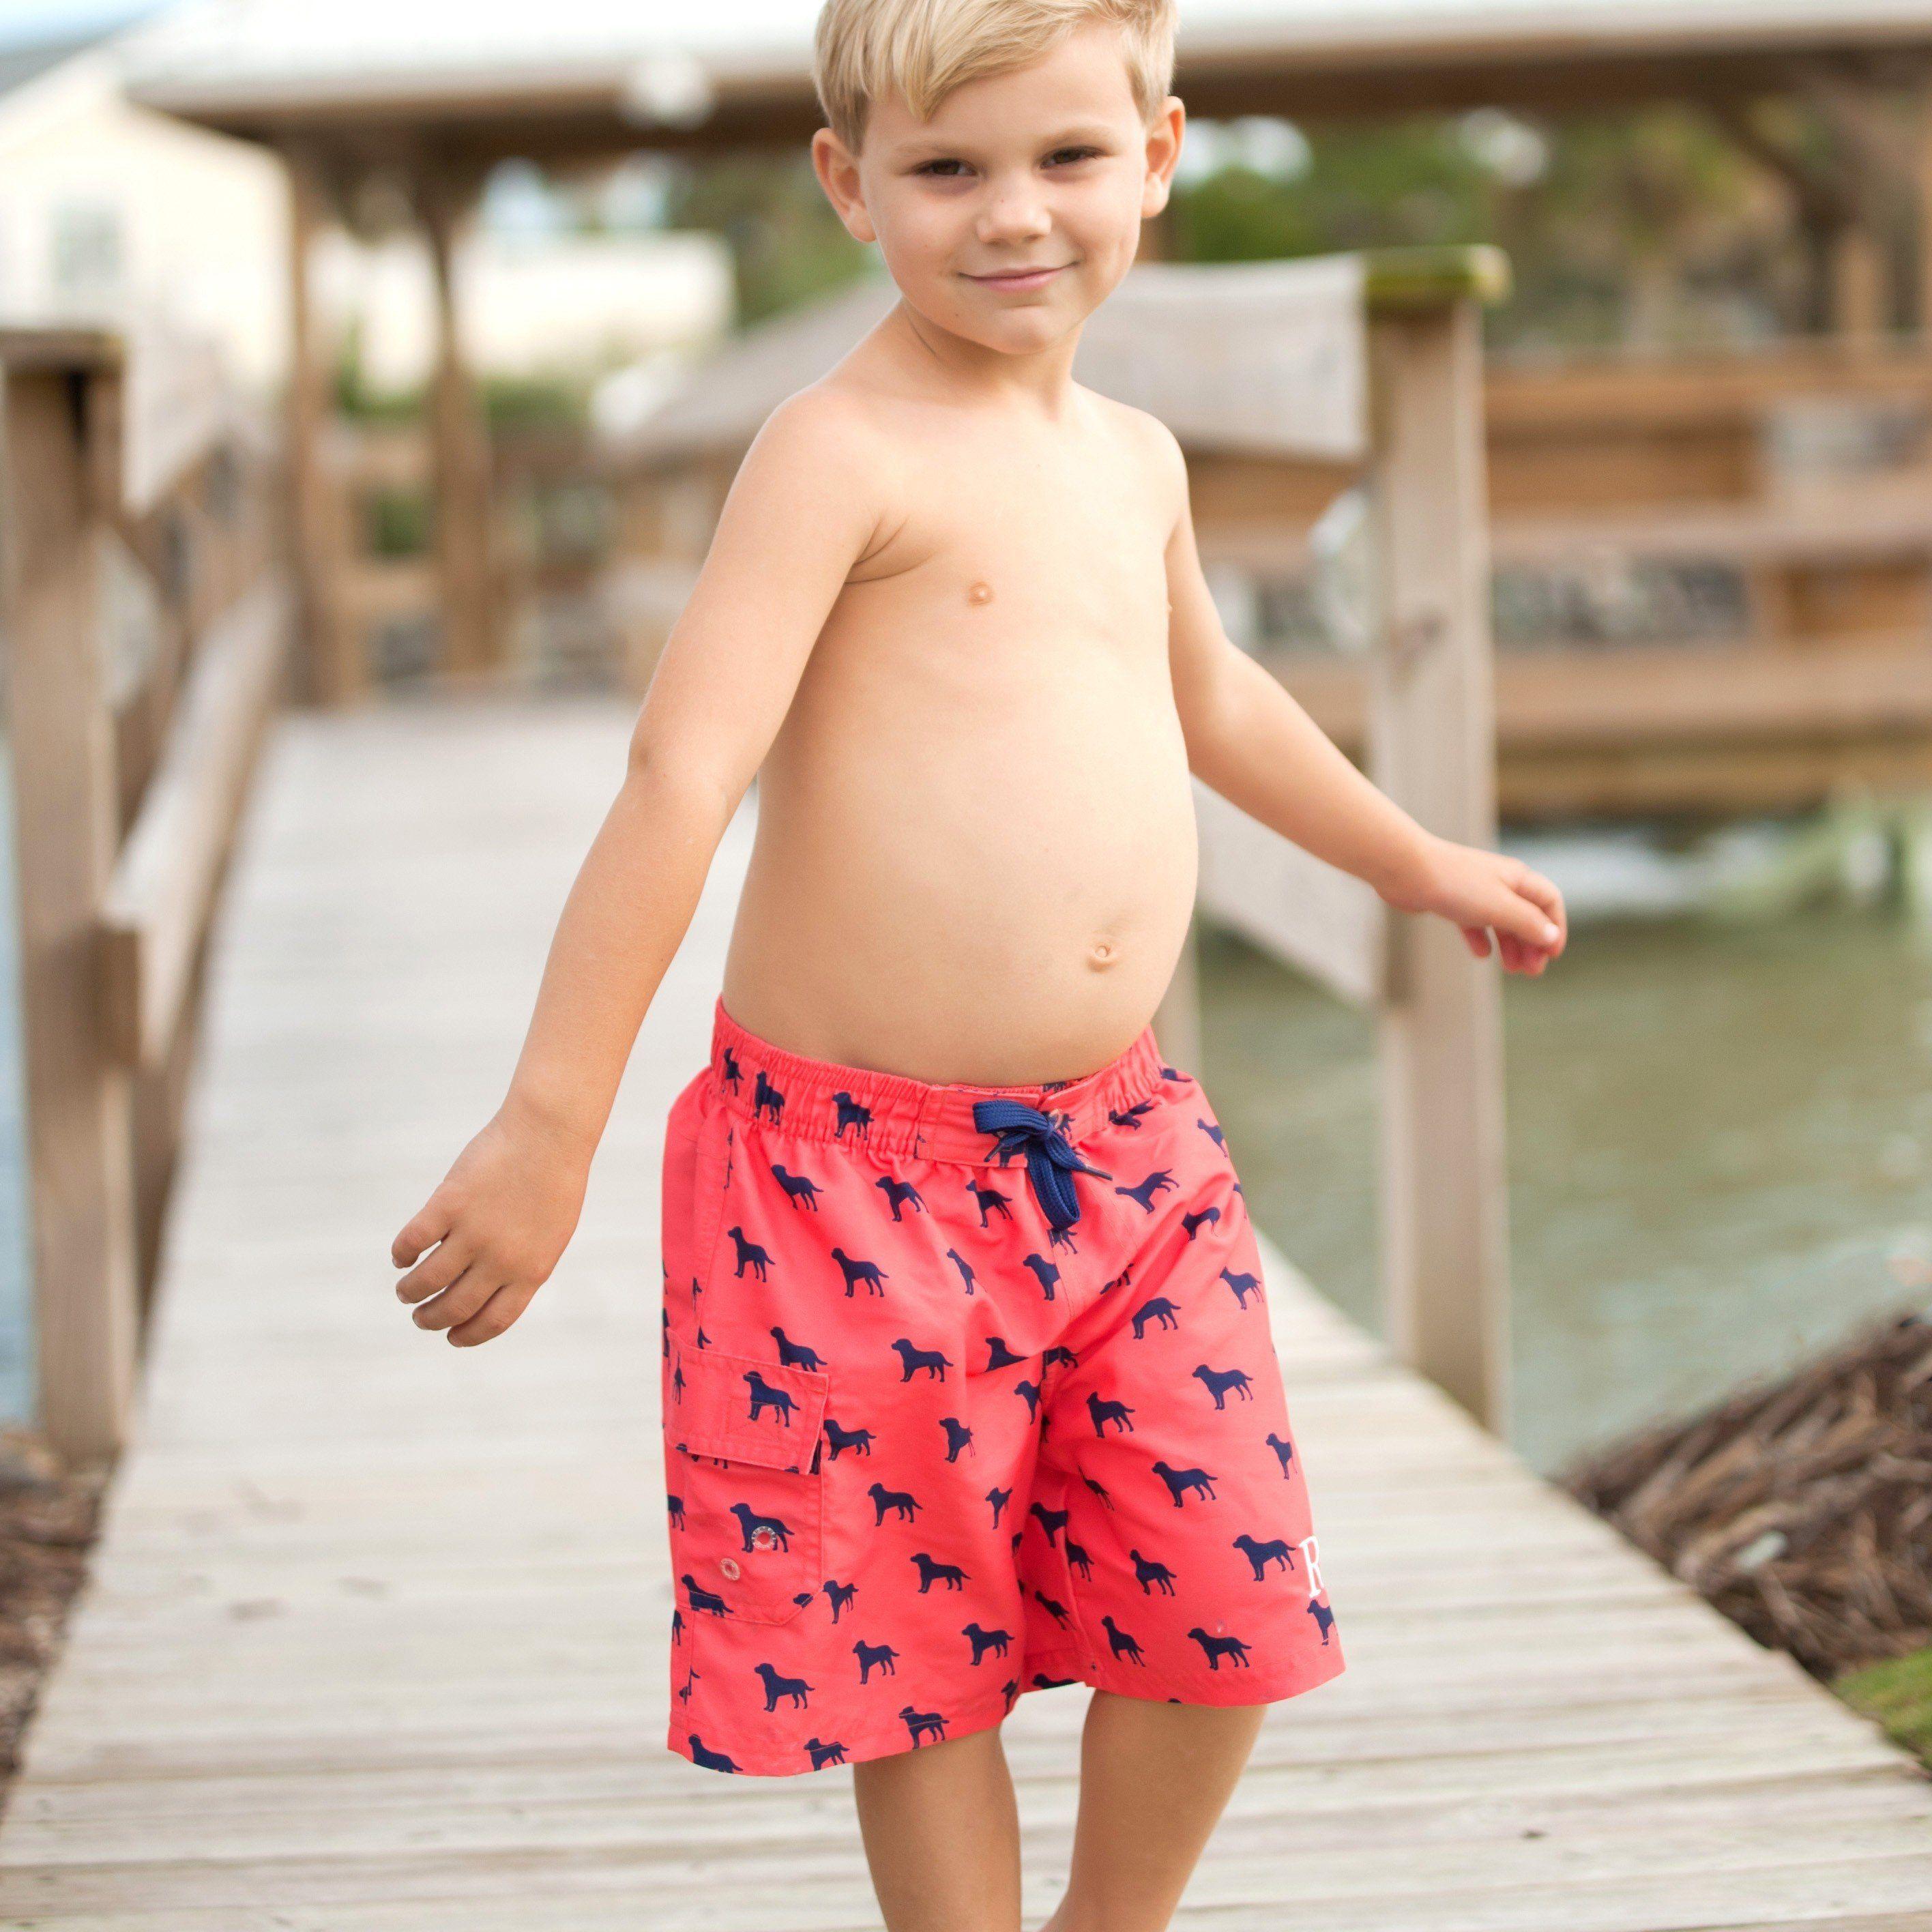 Dog Days Boys Swim Trunks Boy Swimsuits Childrens Bathing